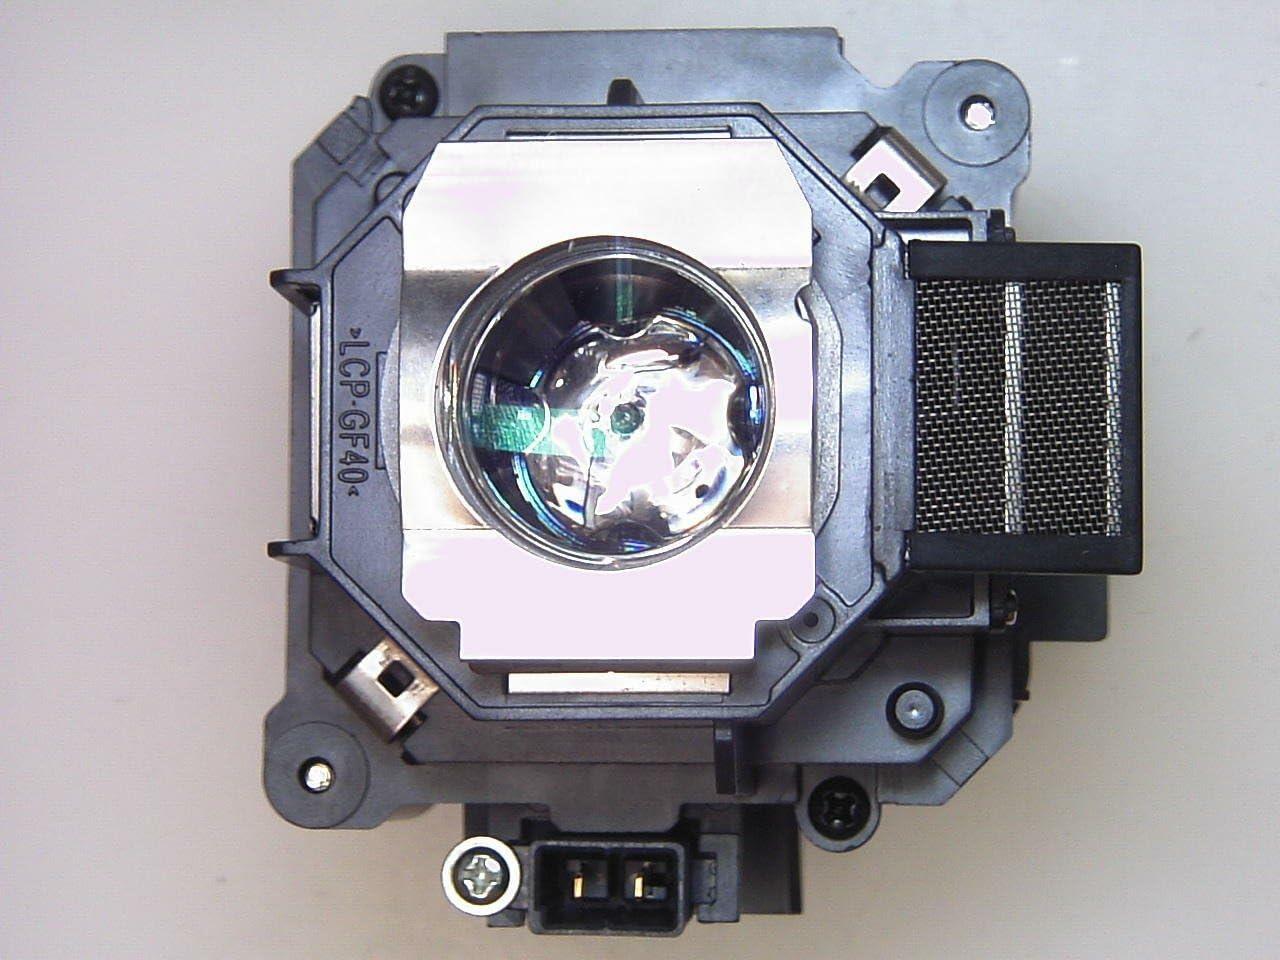 Diamond Lamp for EPSON EB-G5600 Projector with a Ushio bulb inside housing